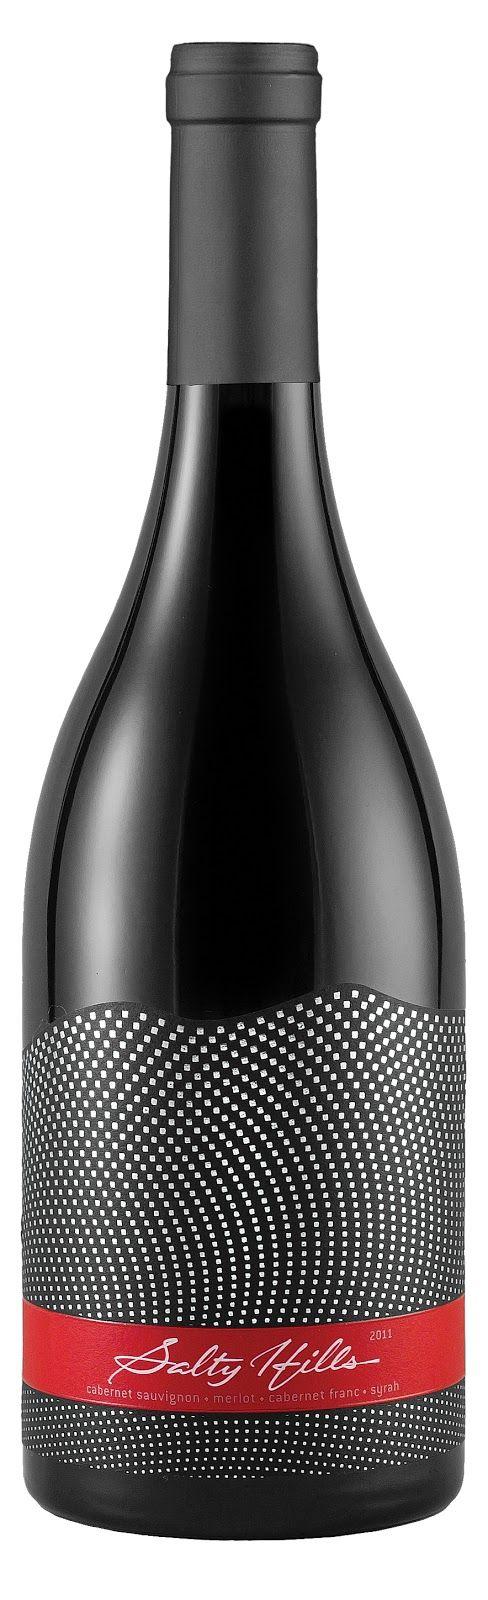 dot wine label design